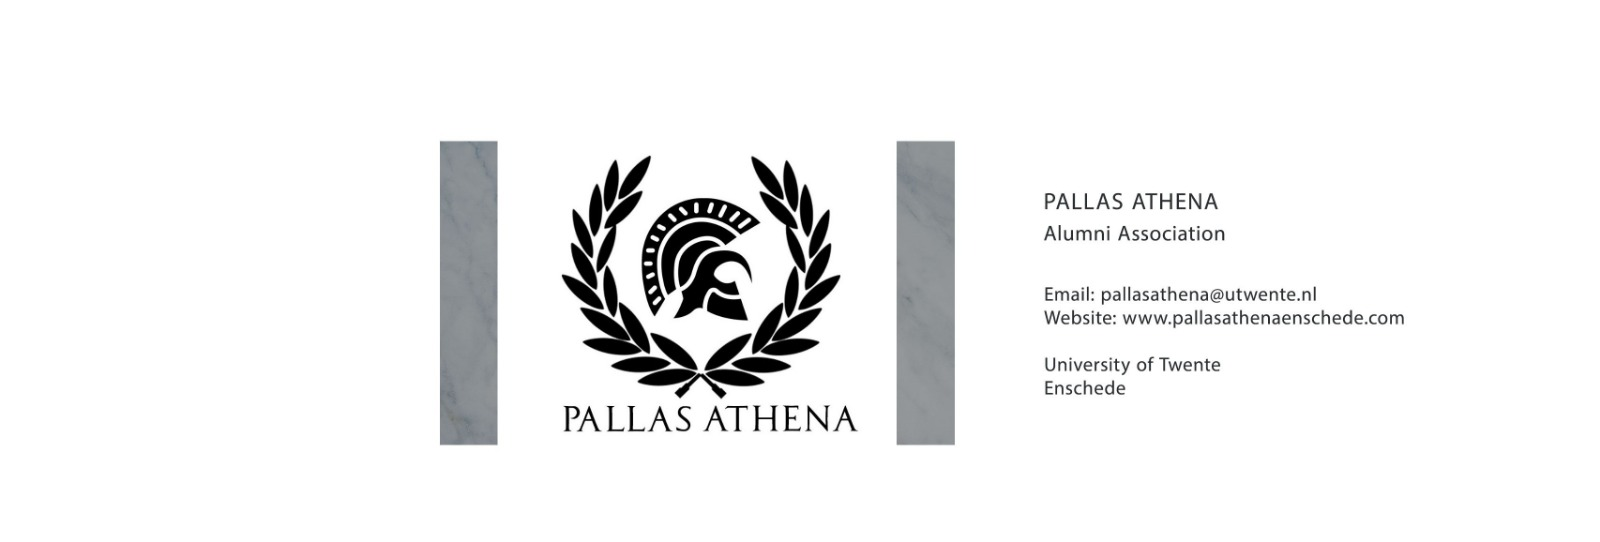 Pallas_Athena_logo.jpeg